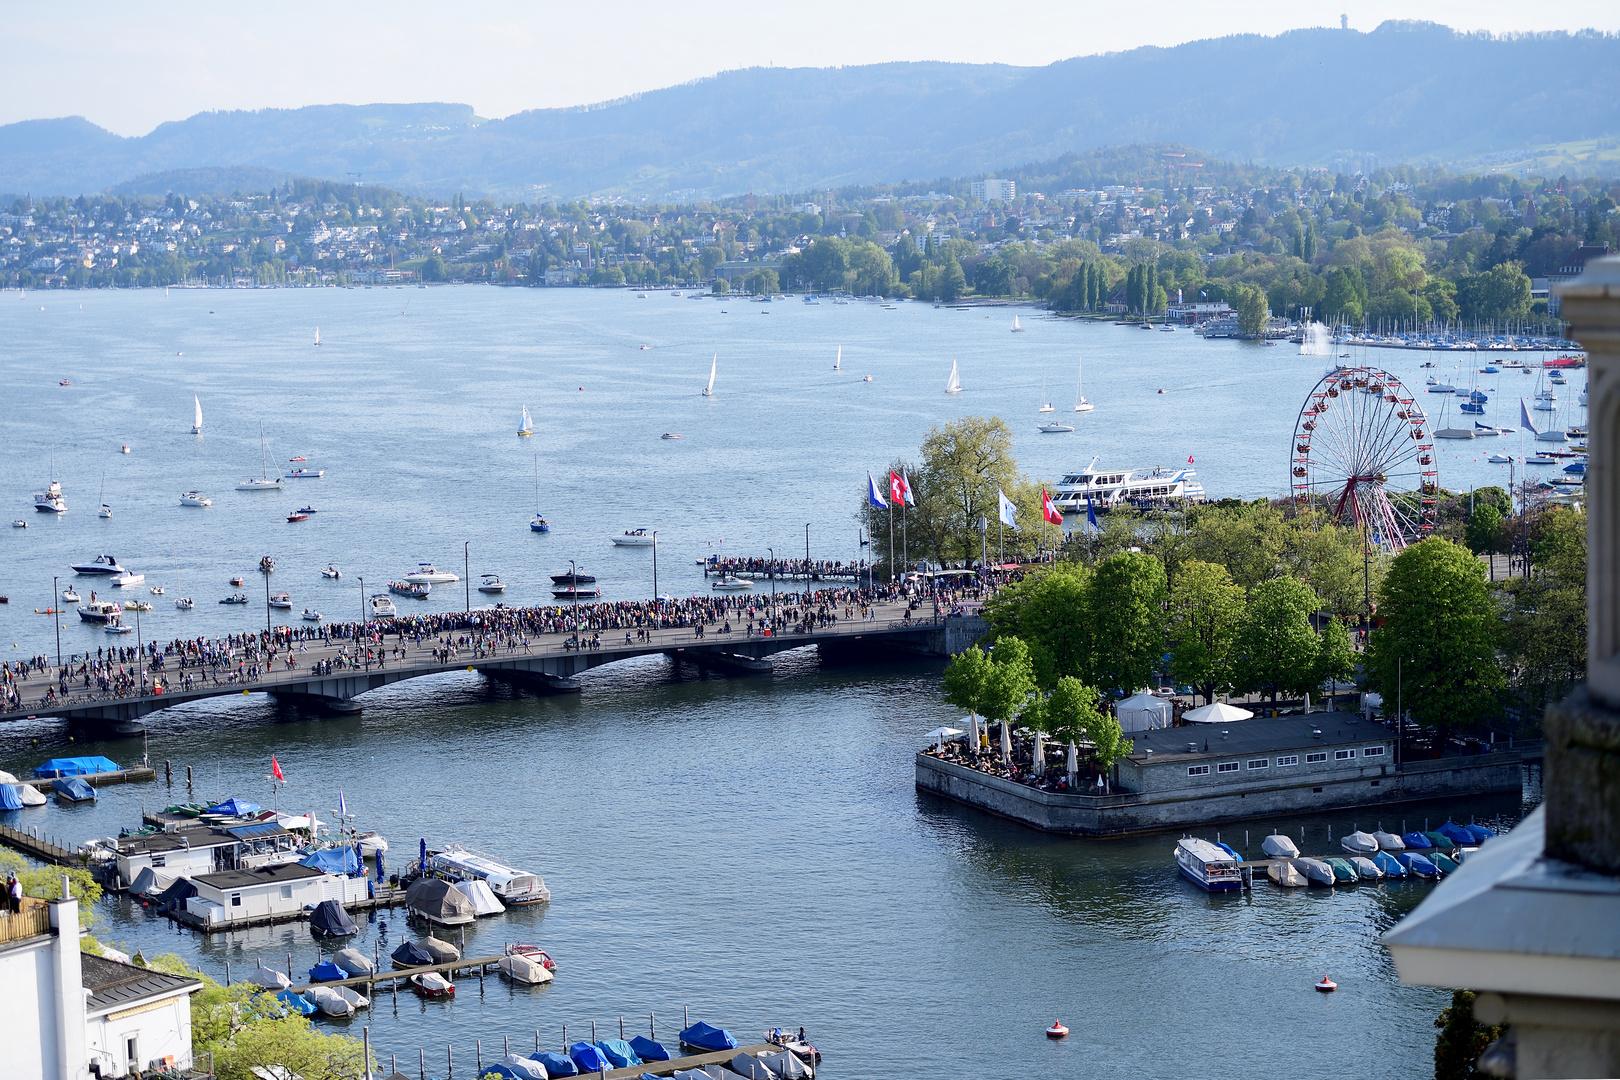 Zürich, Quaibrücke am See/ Riesenrad Bürkliplatz